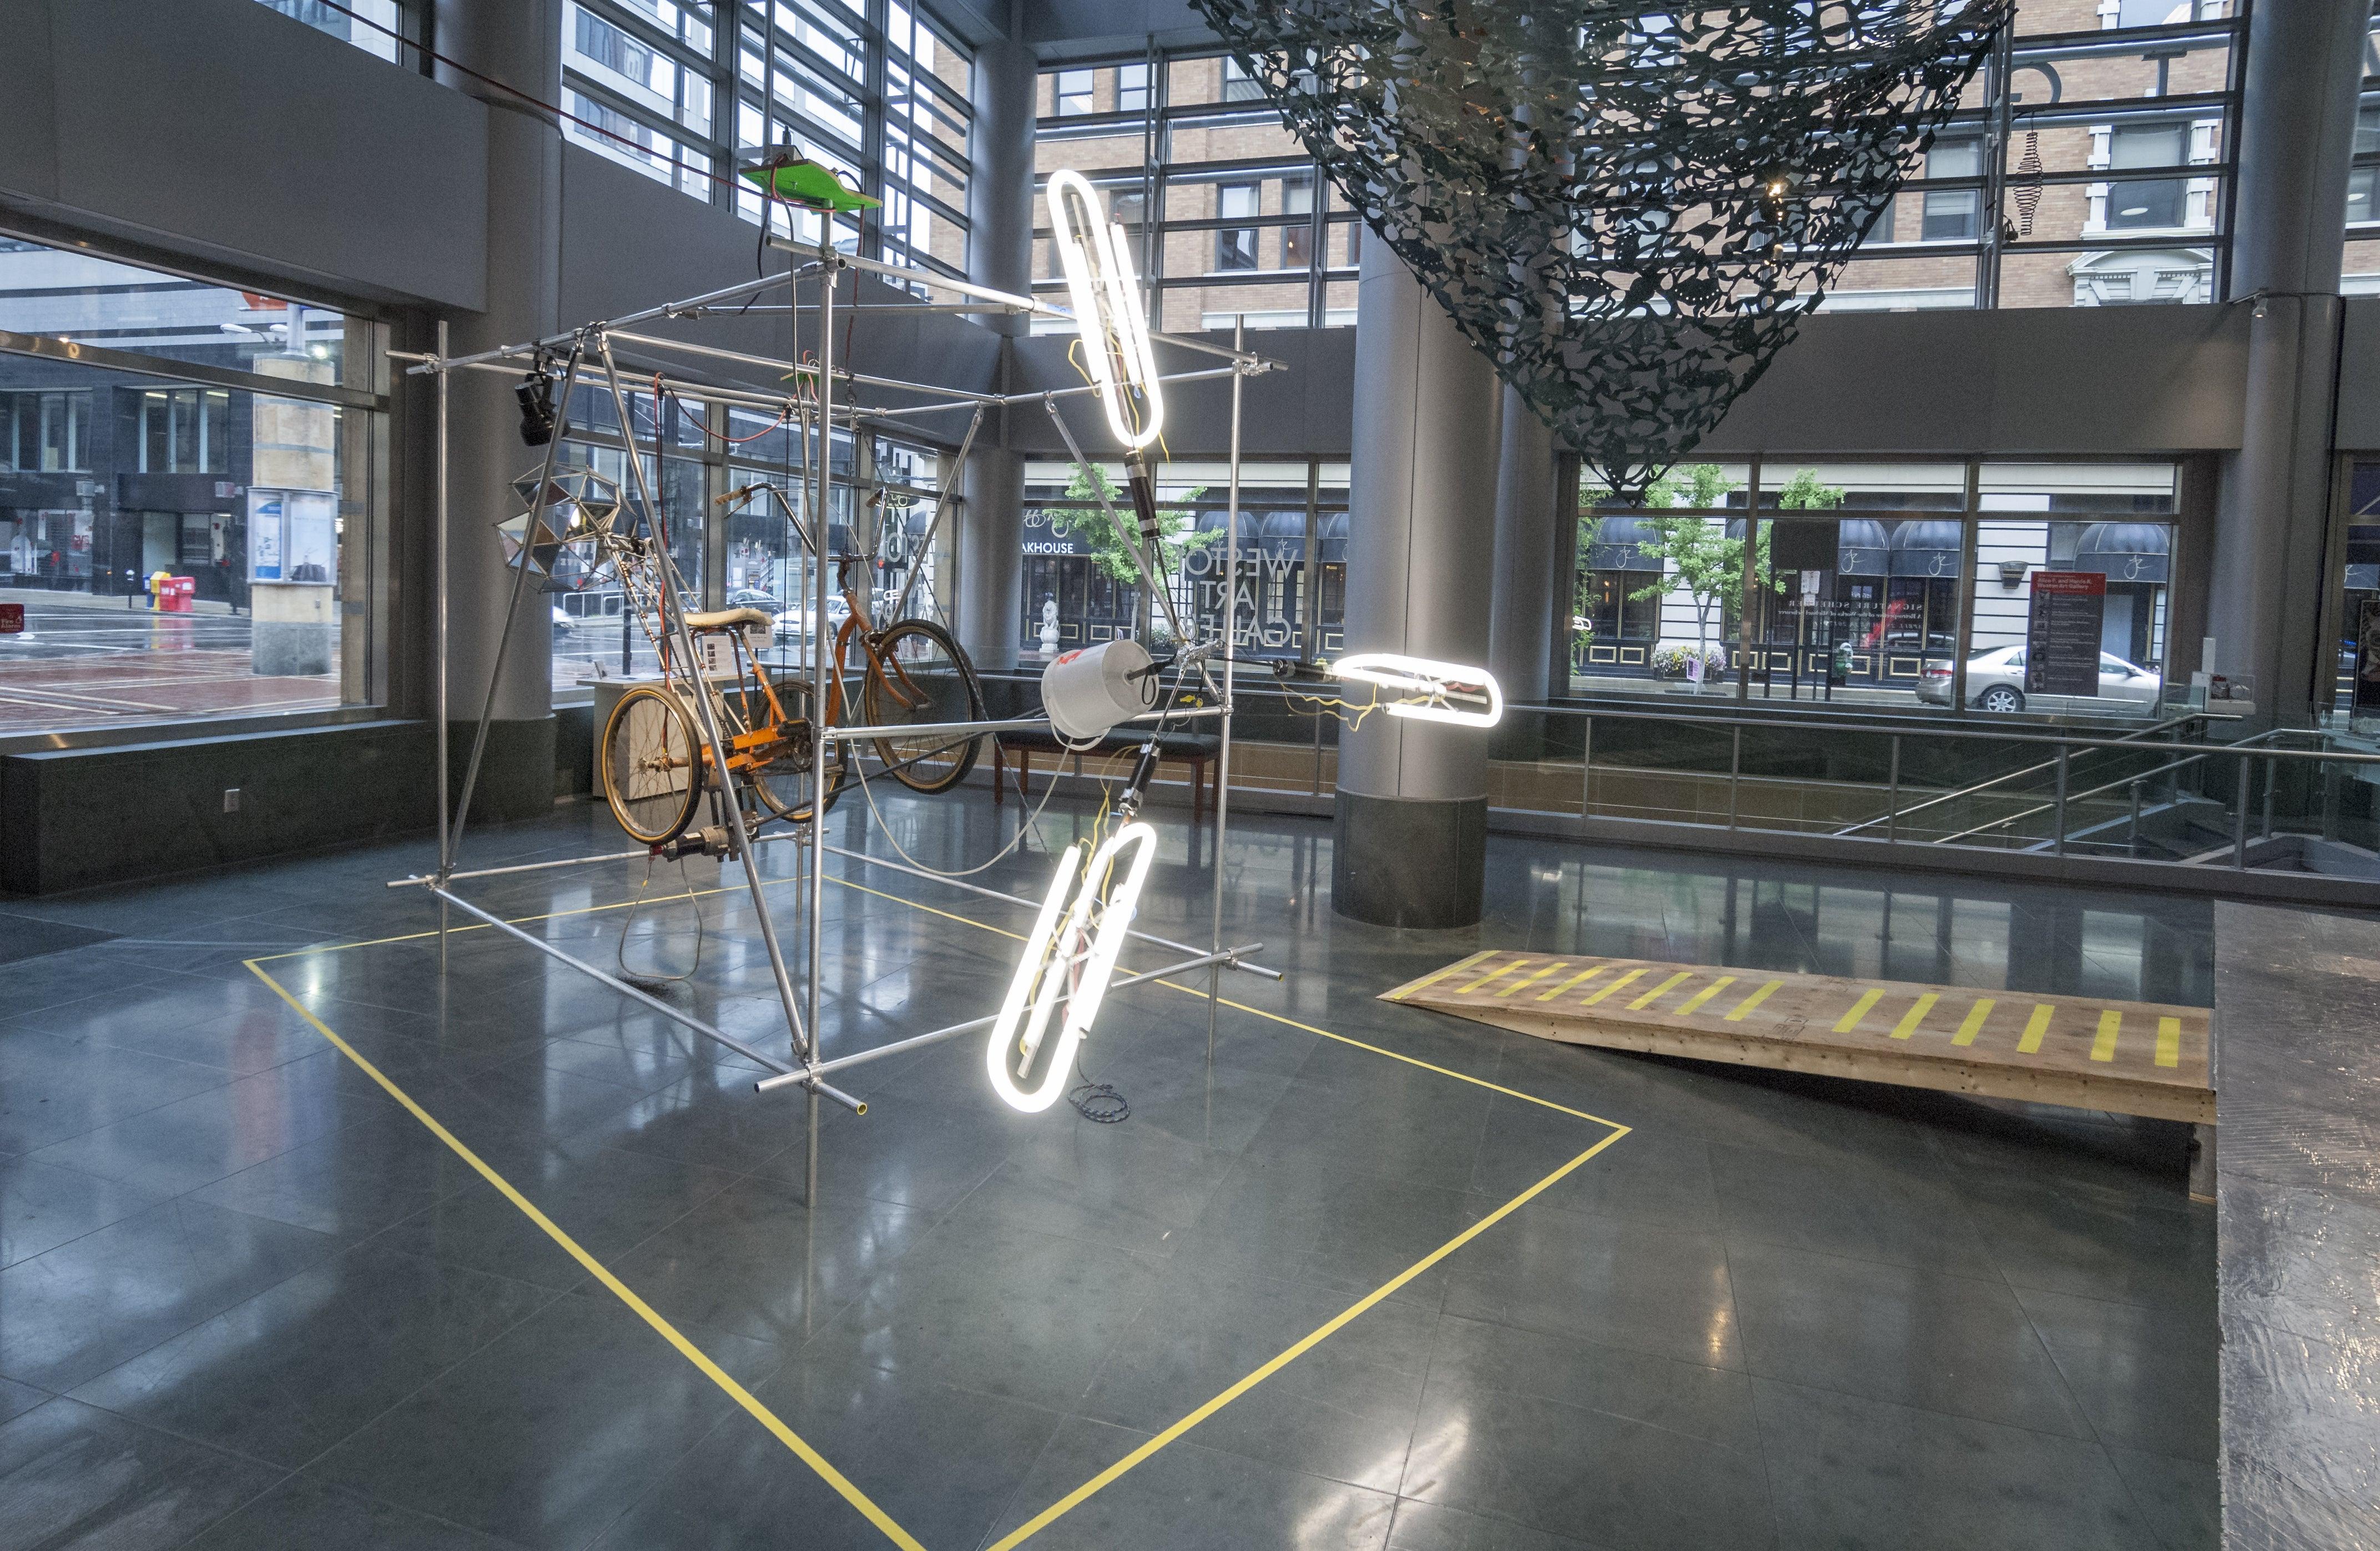 Nate ricciuto the curiosity motive cincinnati arts for Mirror installation